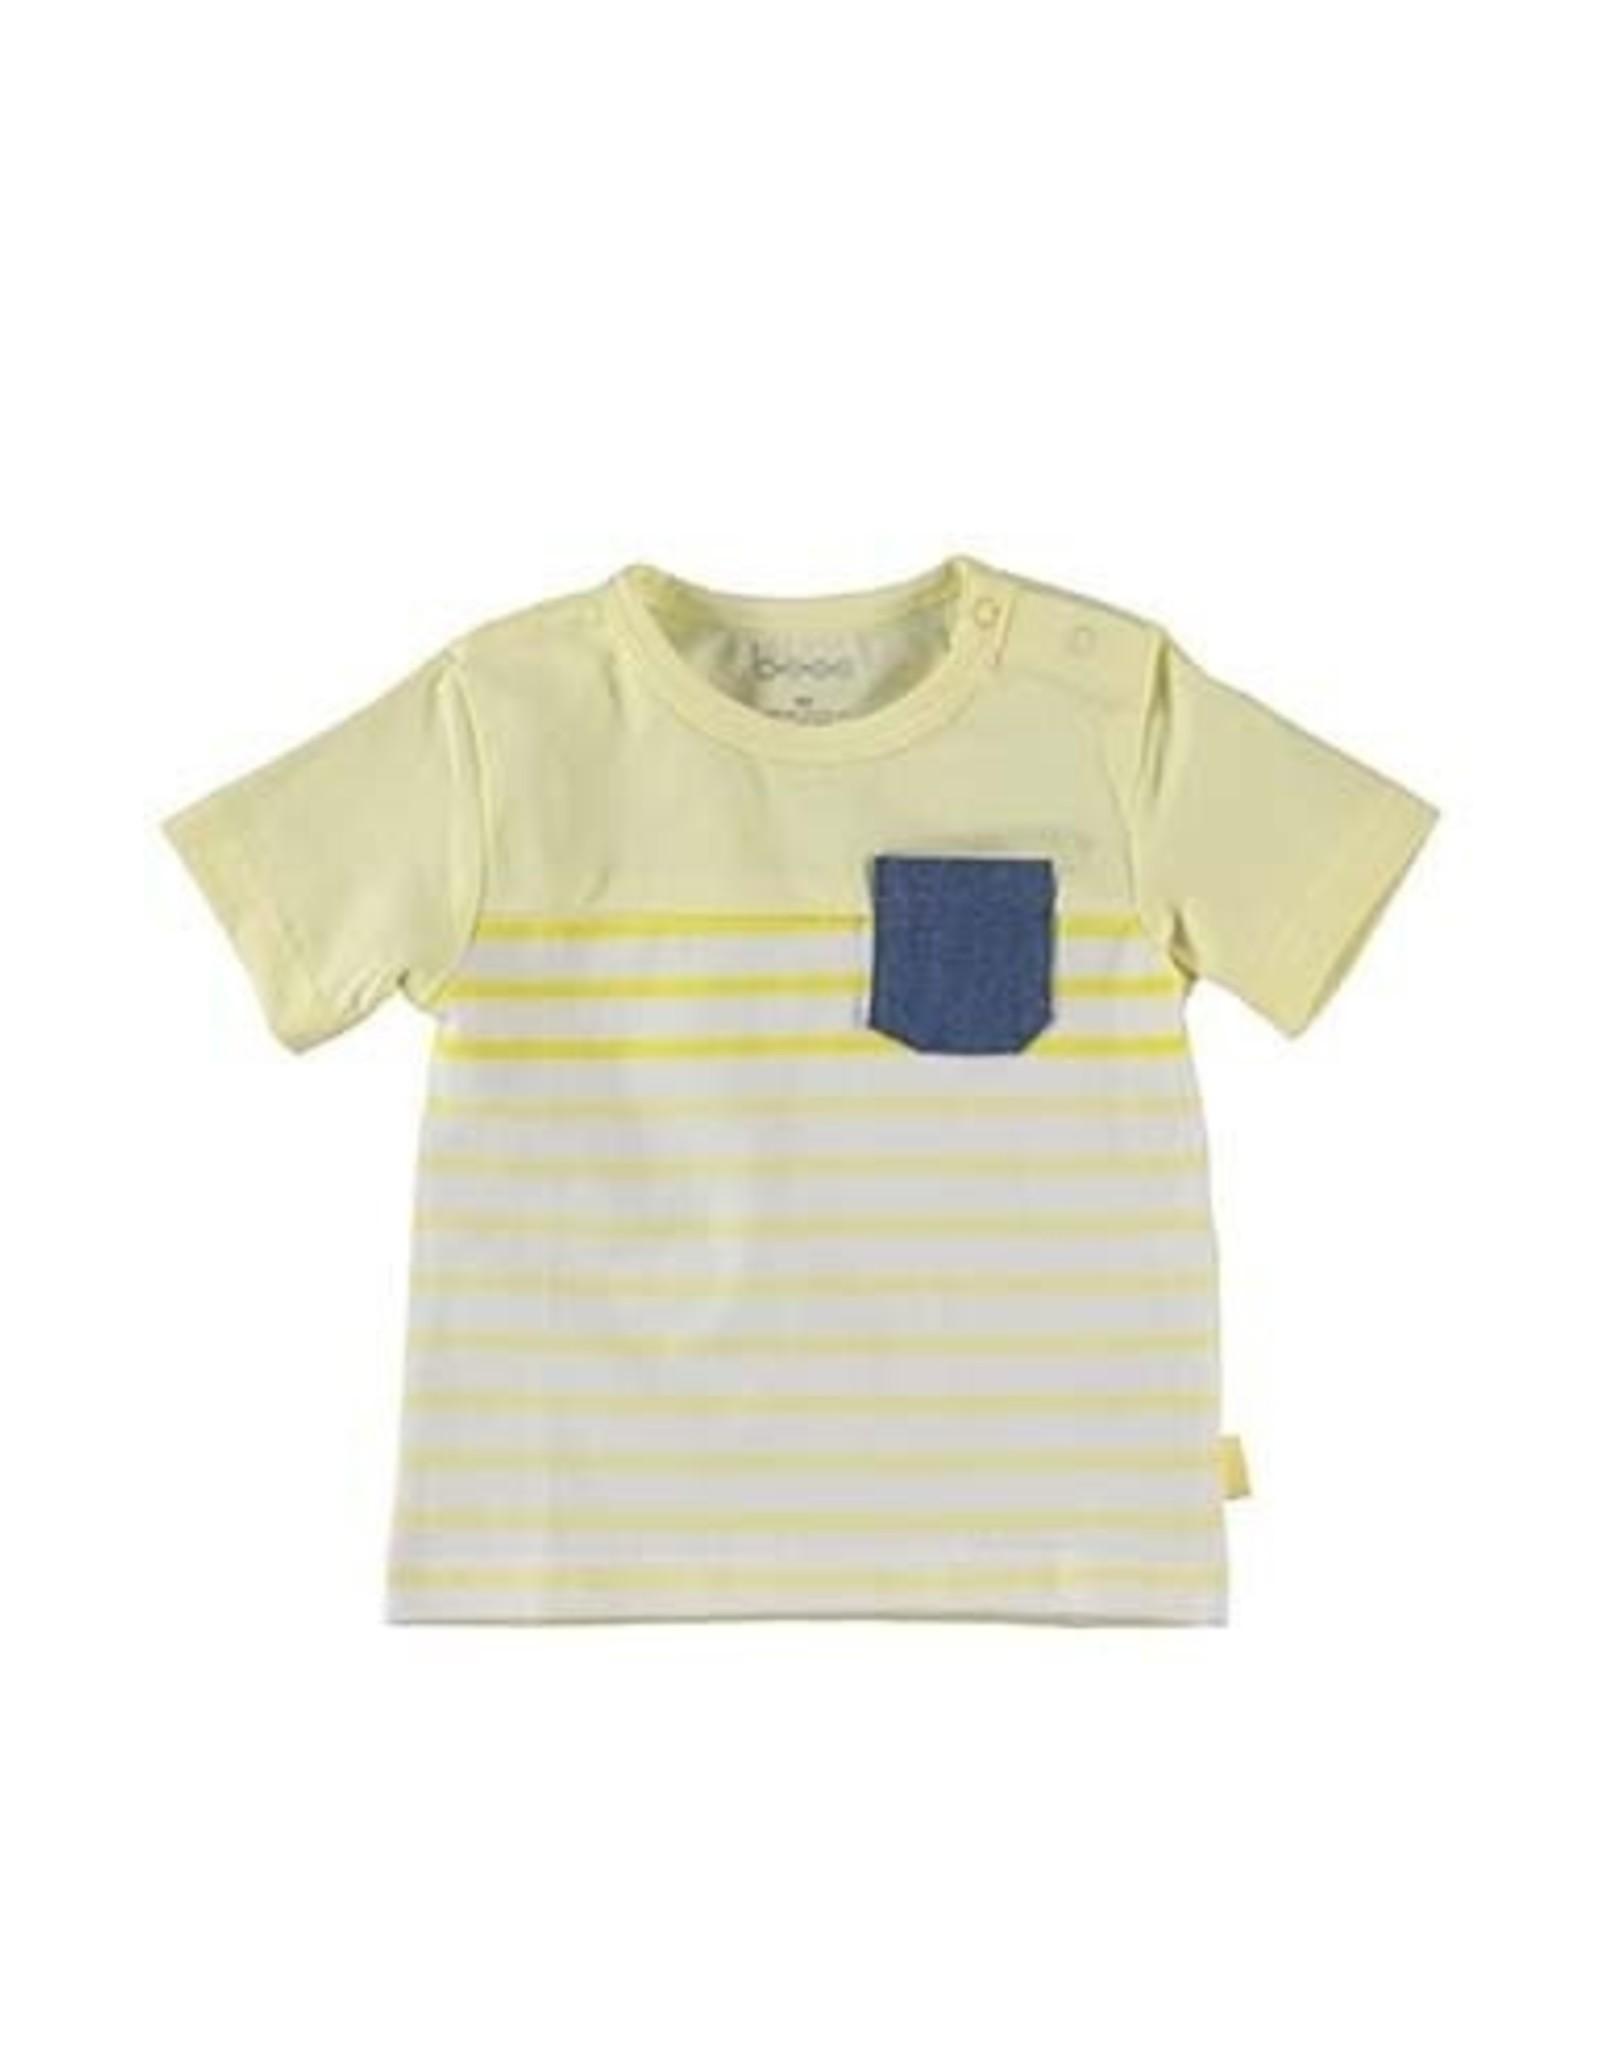 B.E.S.S. Shirt sh.sl. Striped with Pocket, Yellow